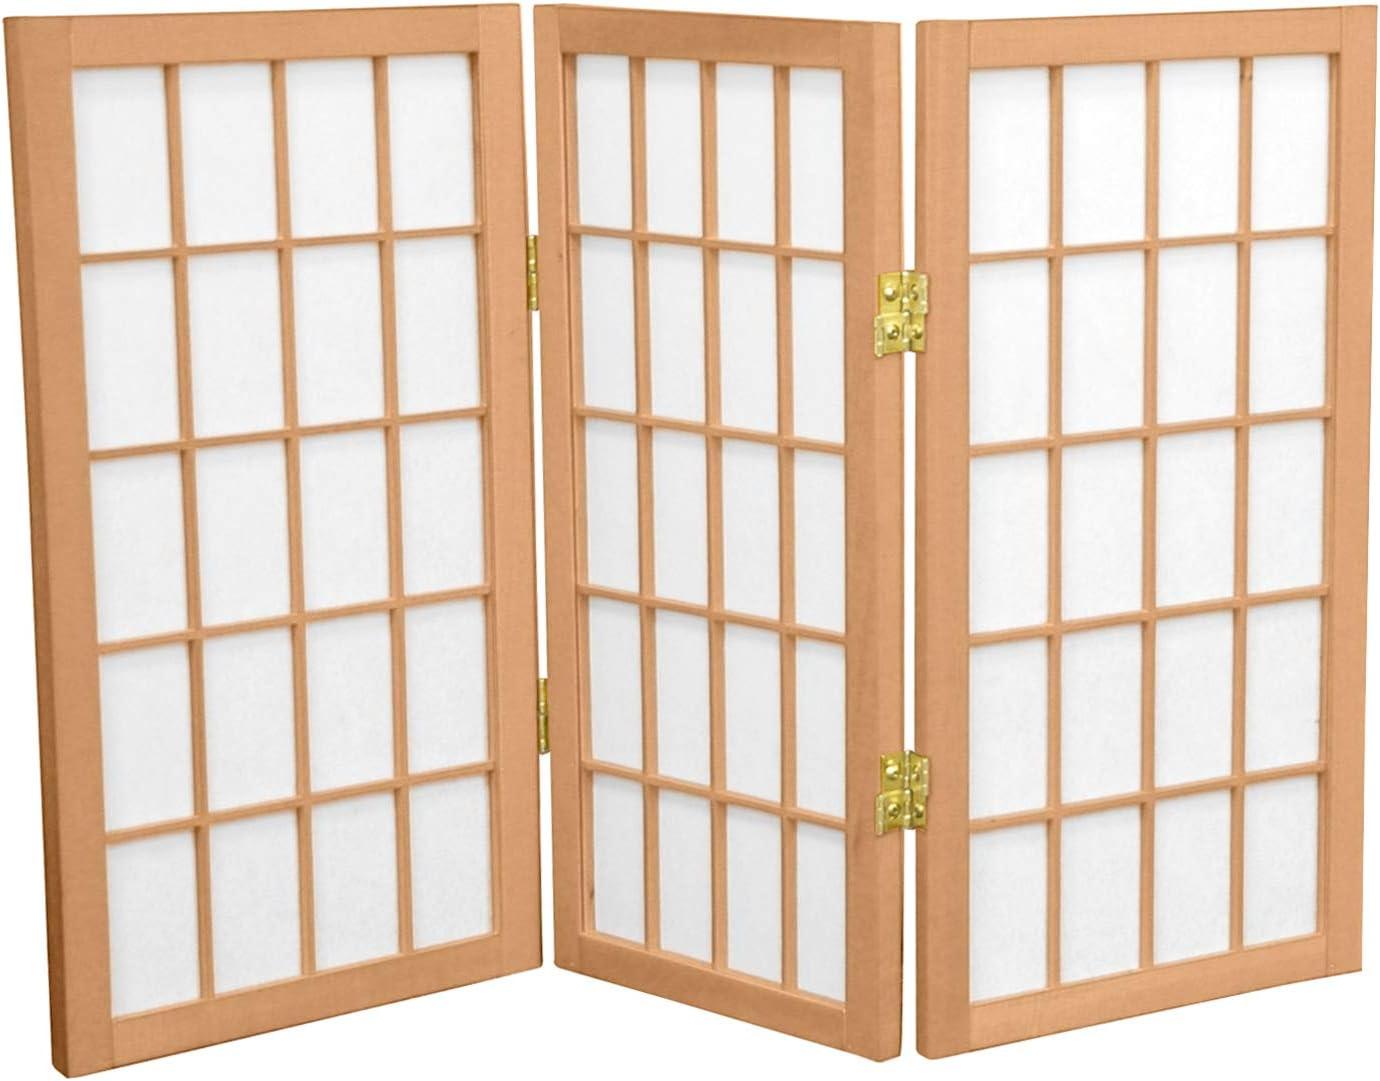 Oriental Furniture 2 ft. Tall Desktop Window Pane Shoji Screen - Natural - 3 Panels